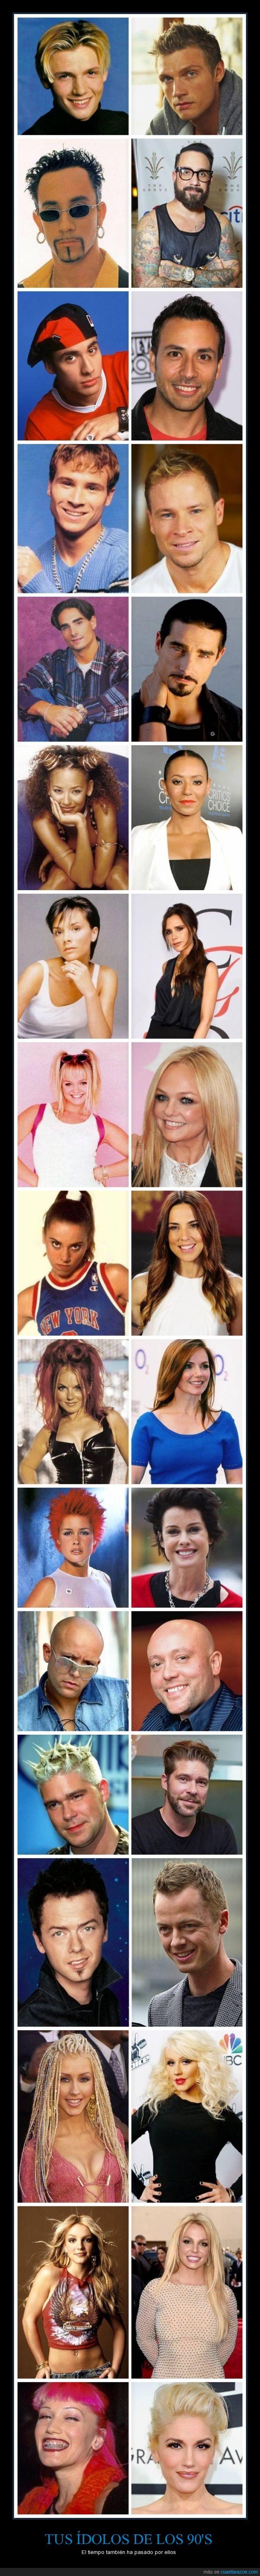 90's,Aqua,Backstreet Boys,Britney Spears,Christina Aguilera,decada,Gwen Stefani,idolos,noventas,Spice Girls